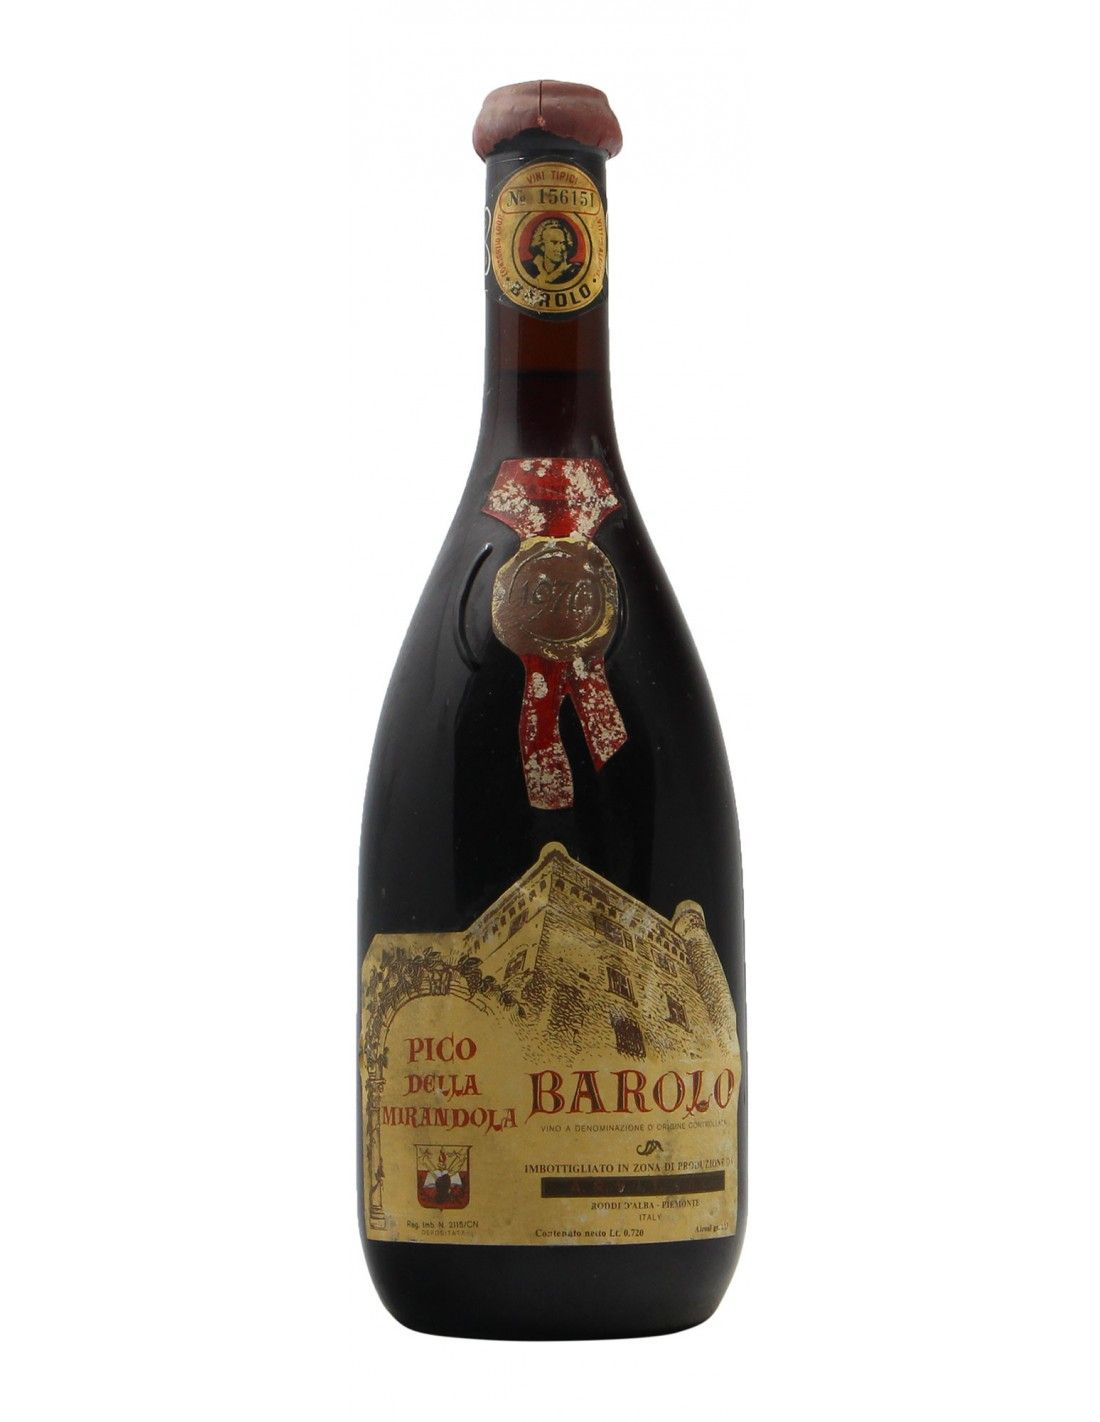 BARBARESCO 1976 PICO DELLA MIRANDOLA Grandi Bottiglie